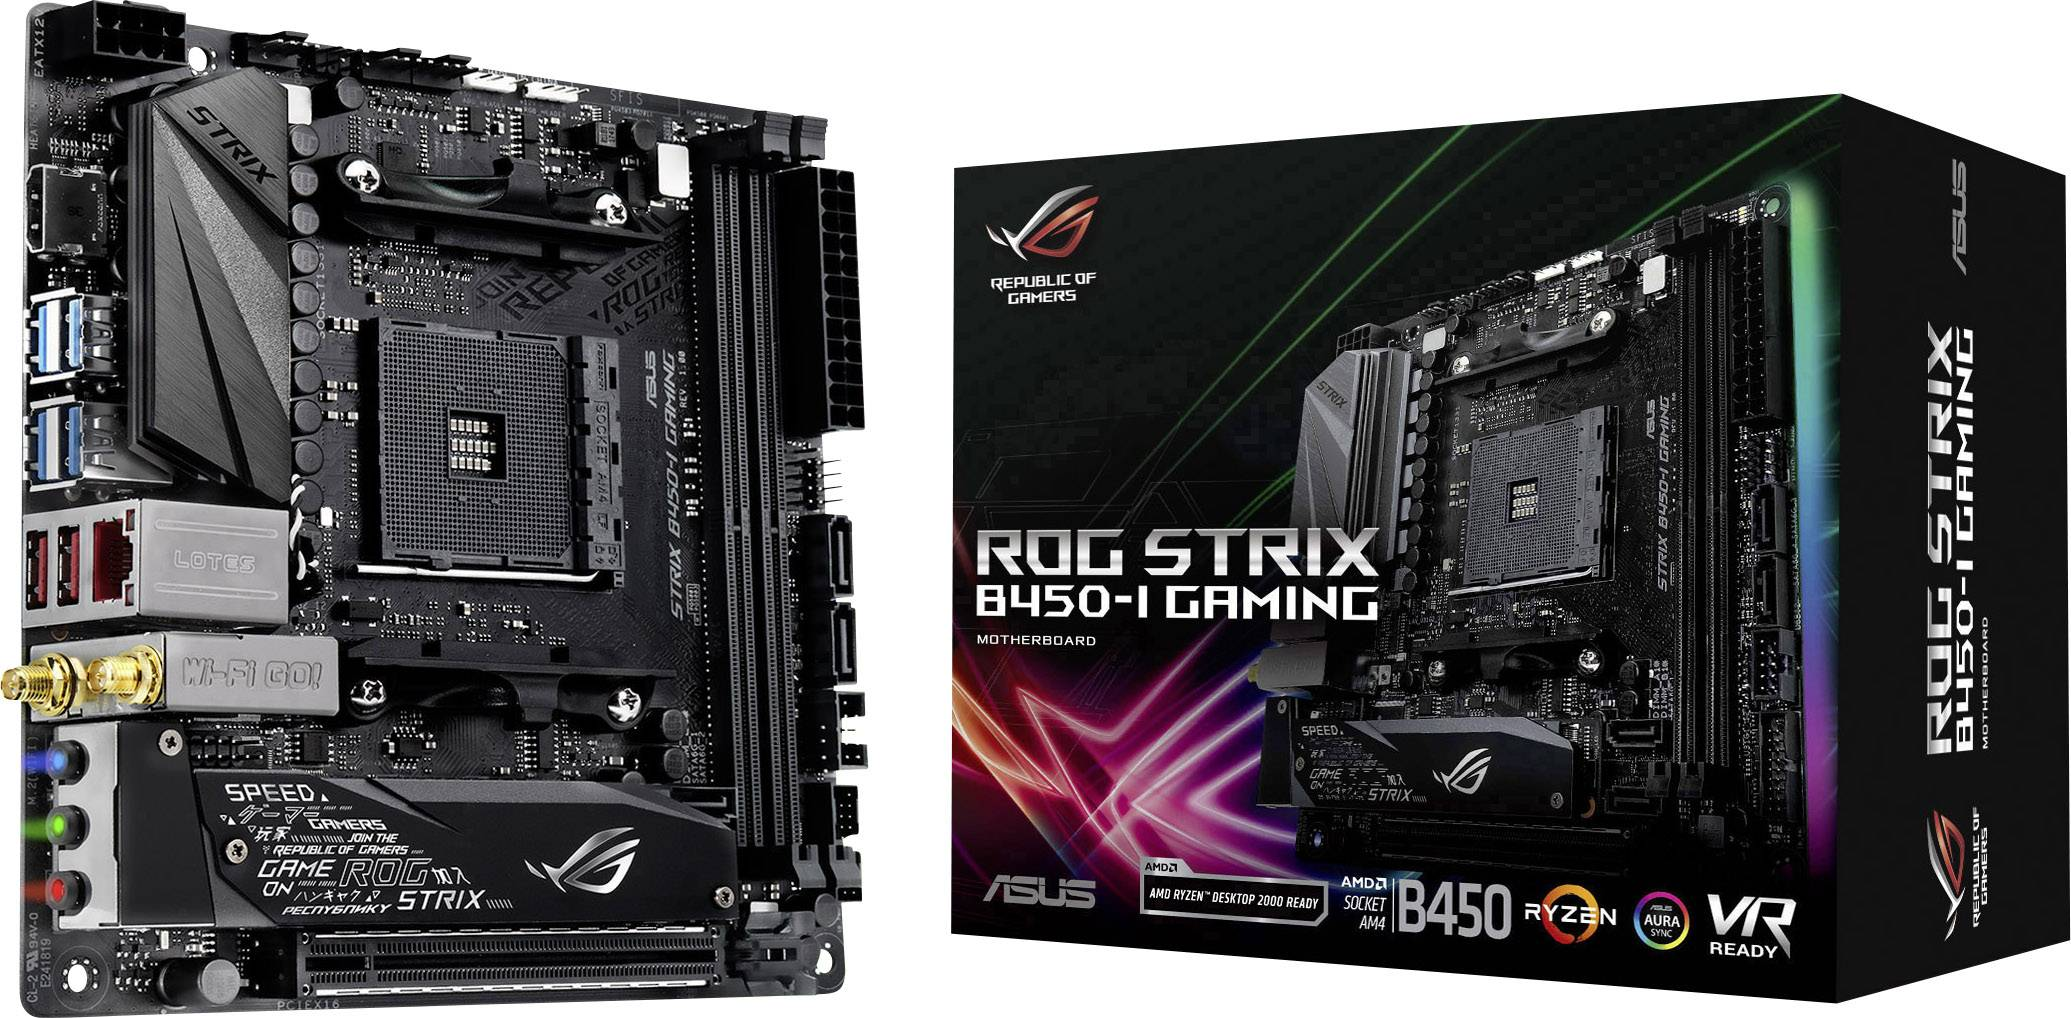 Asus ROG Strix B450-I Gaming Motherboard PC base AMD AM4